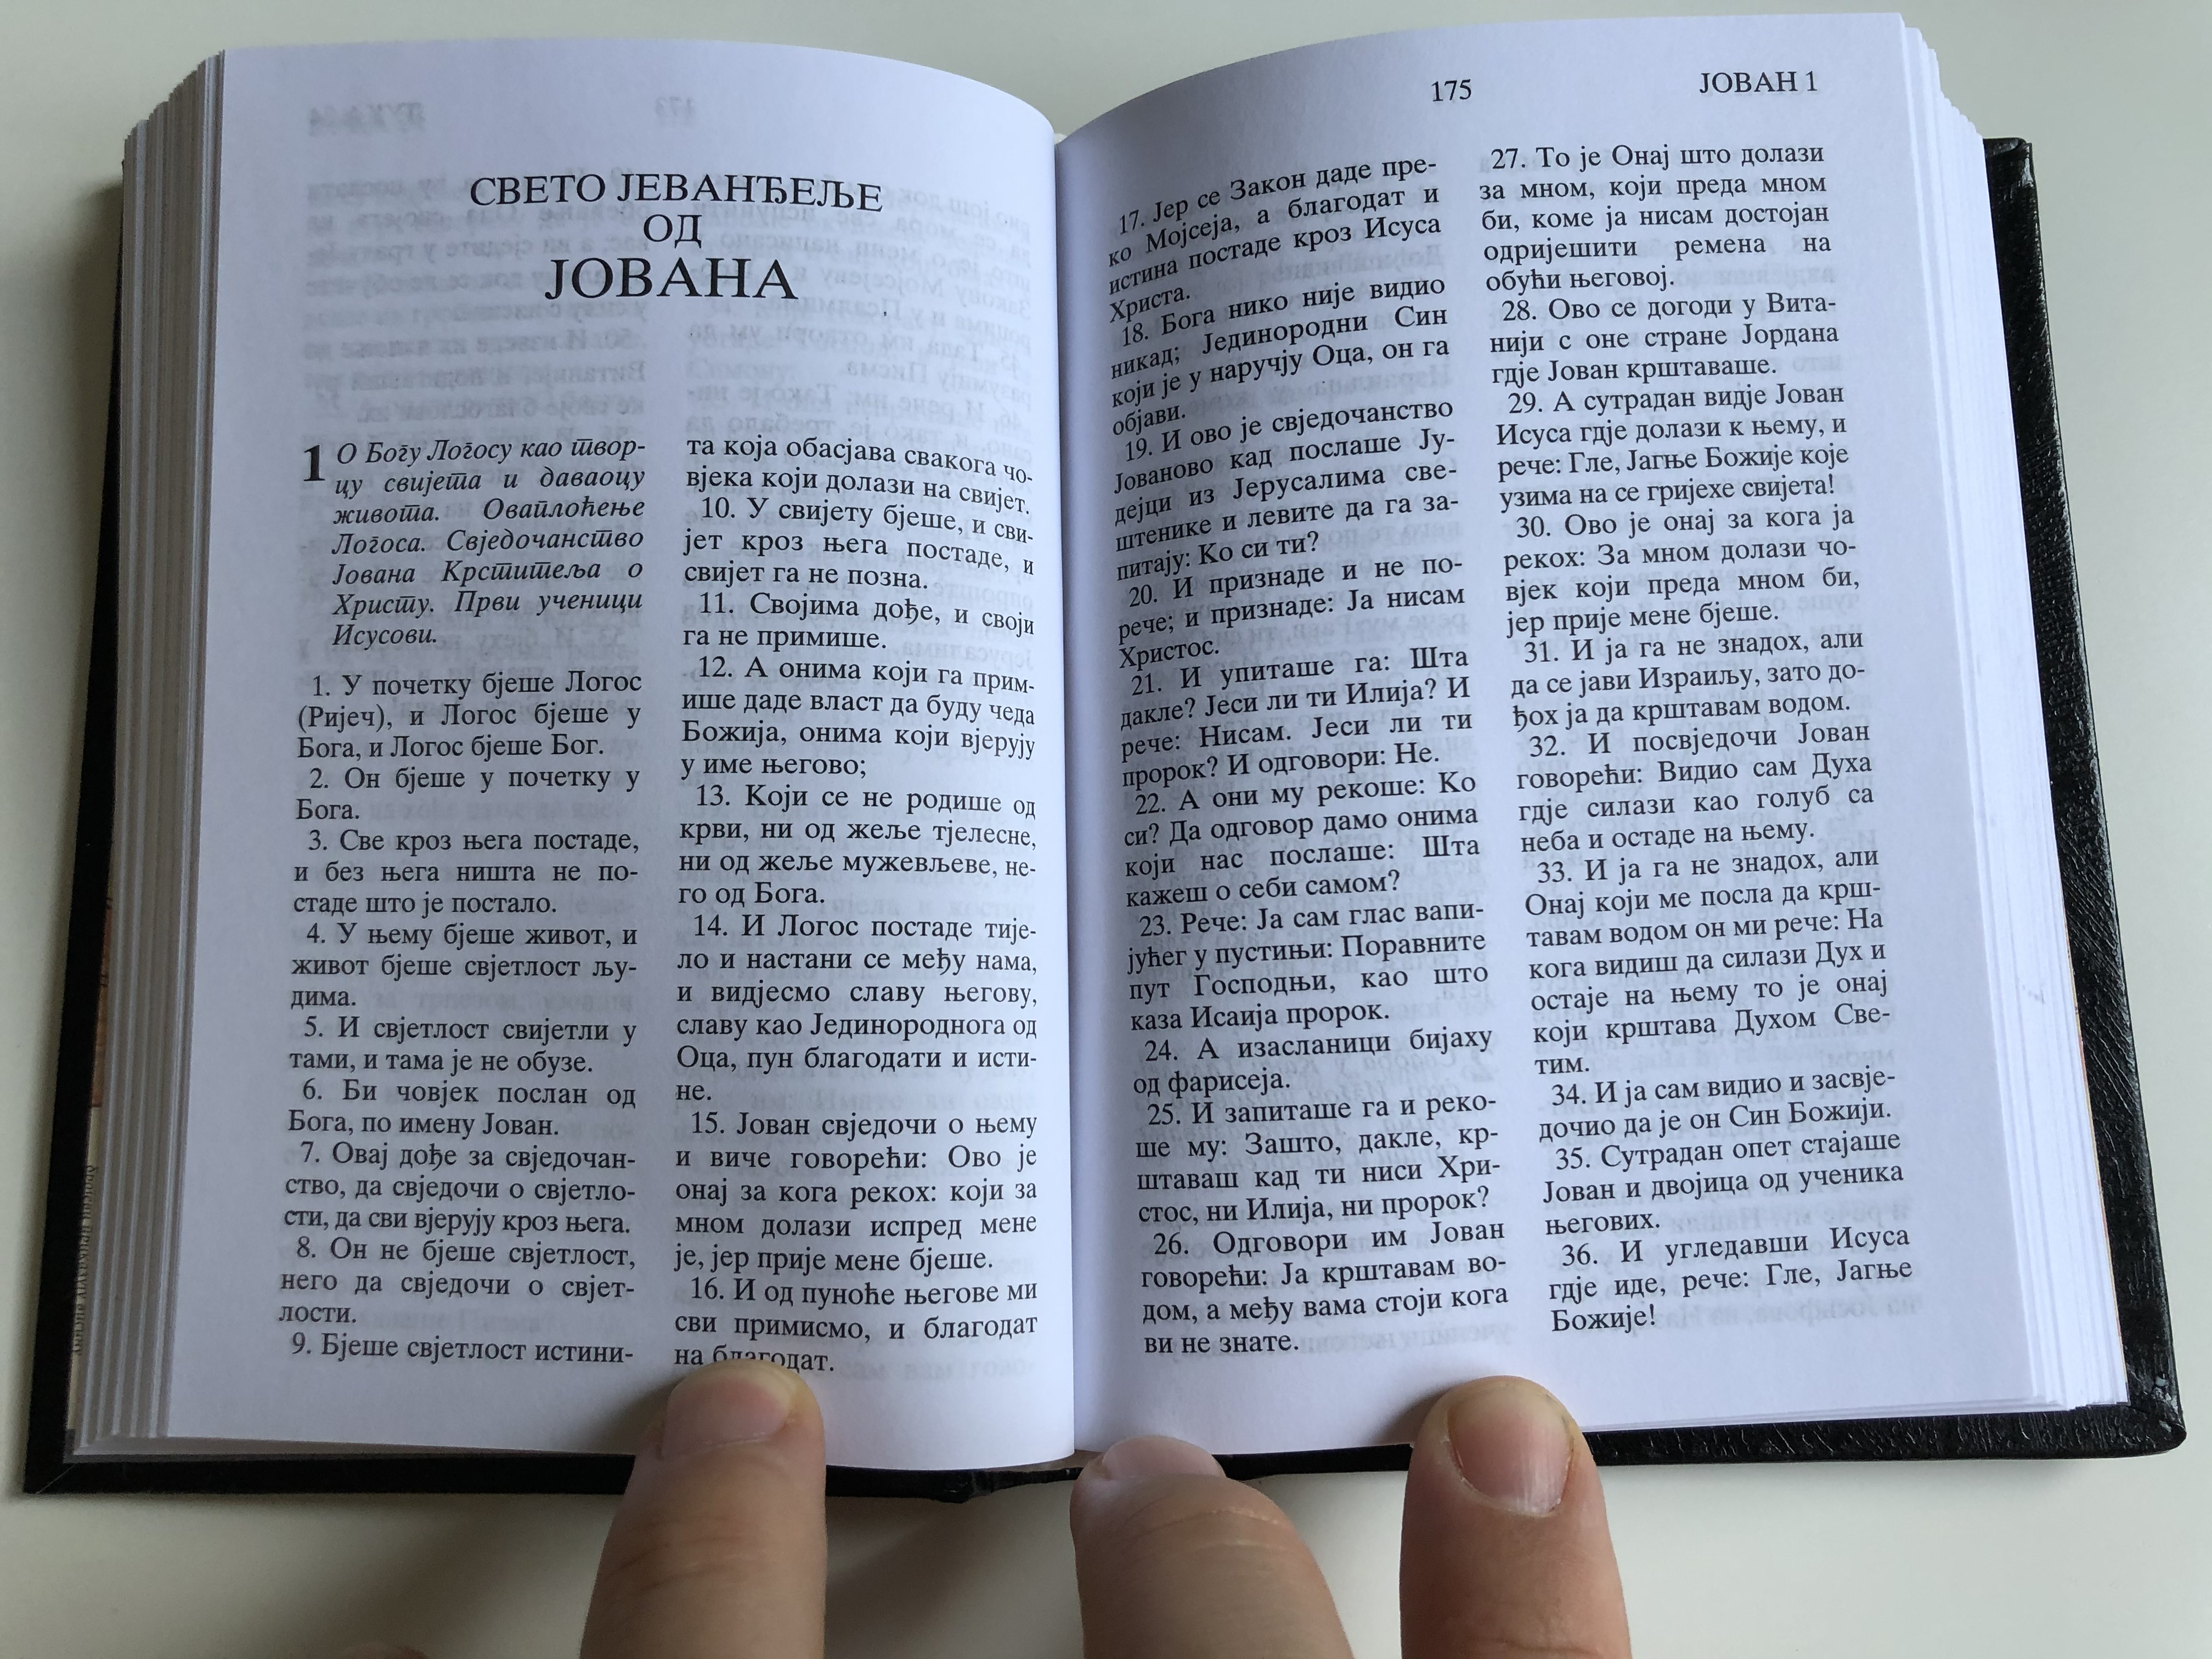 novi-zavjet-serbian-orthodox-traditional-new-testament-black-synodal-translation-10th-edition-2018-hardcover-6.jpg